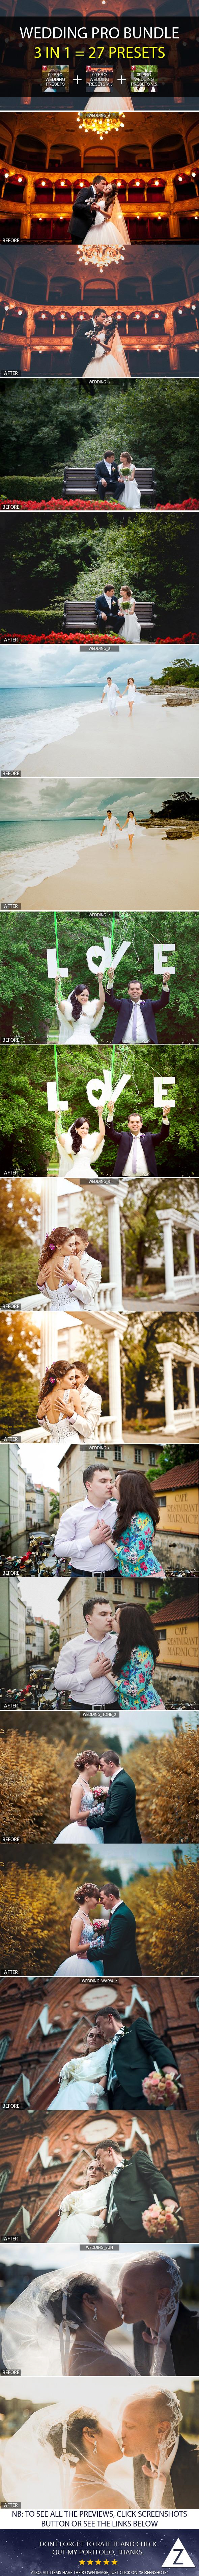 GraphicRiver 3-in-1 Pro Wedding Bundle 8830304